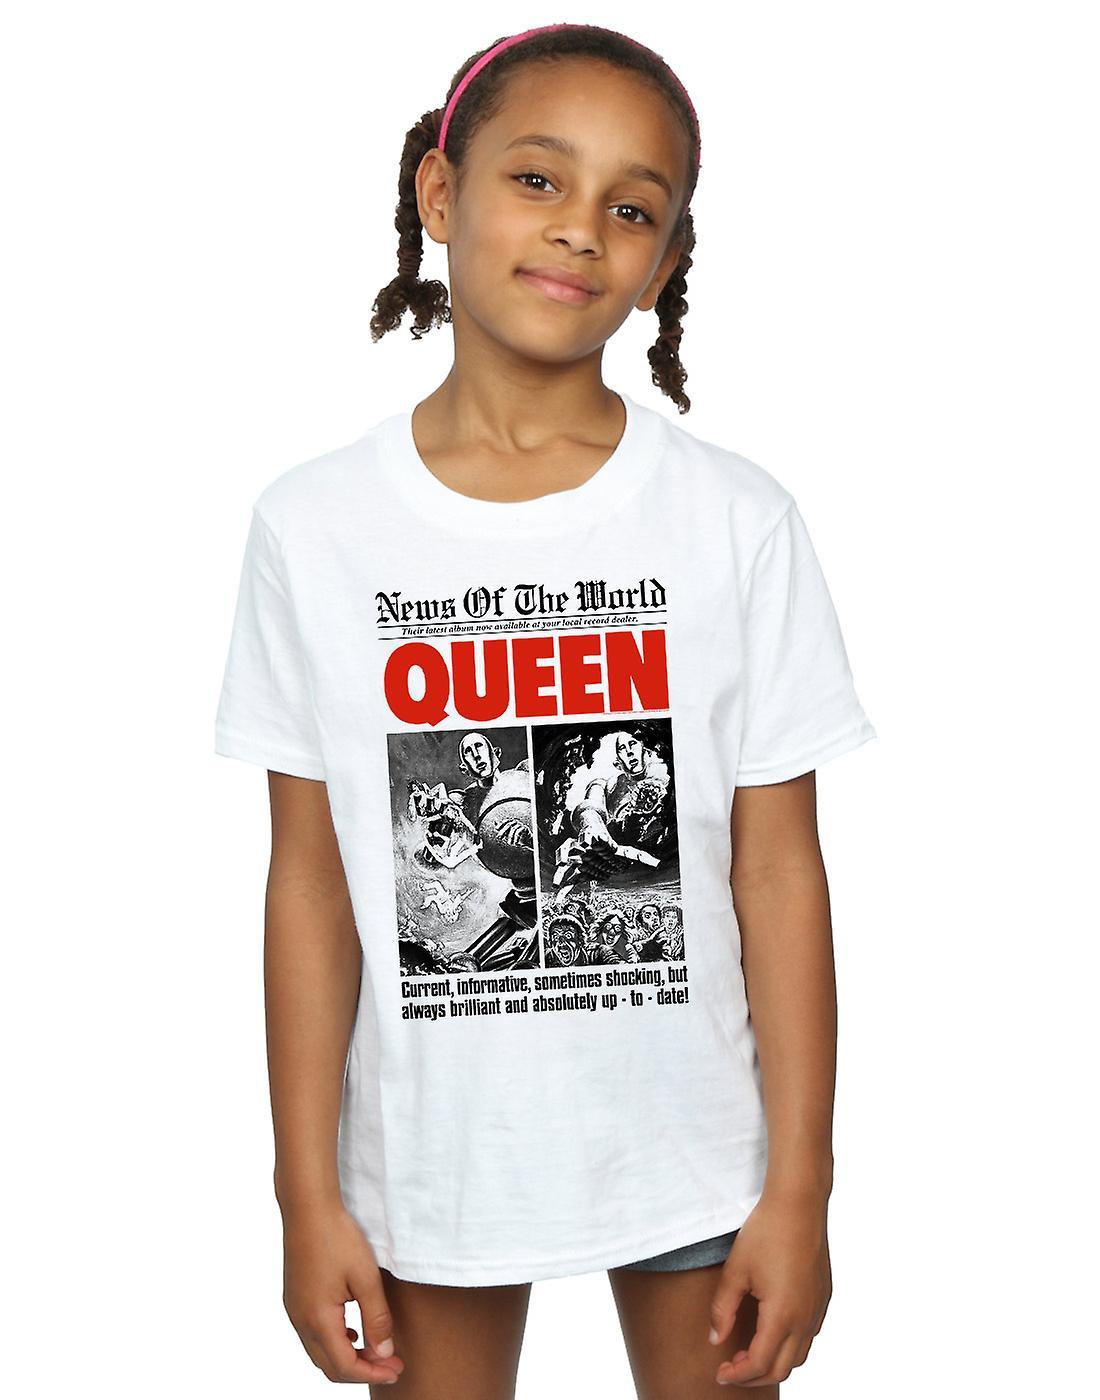 Reina chicas corriente informativo t-shirt